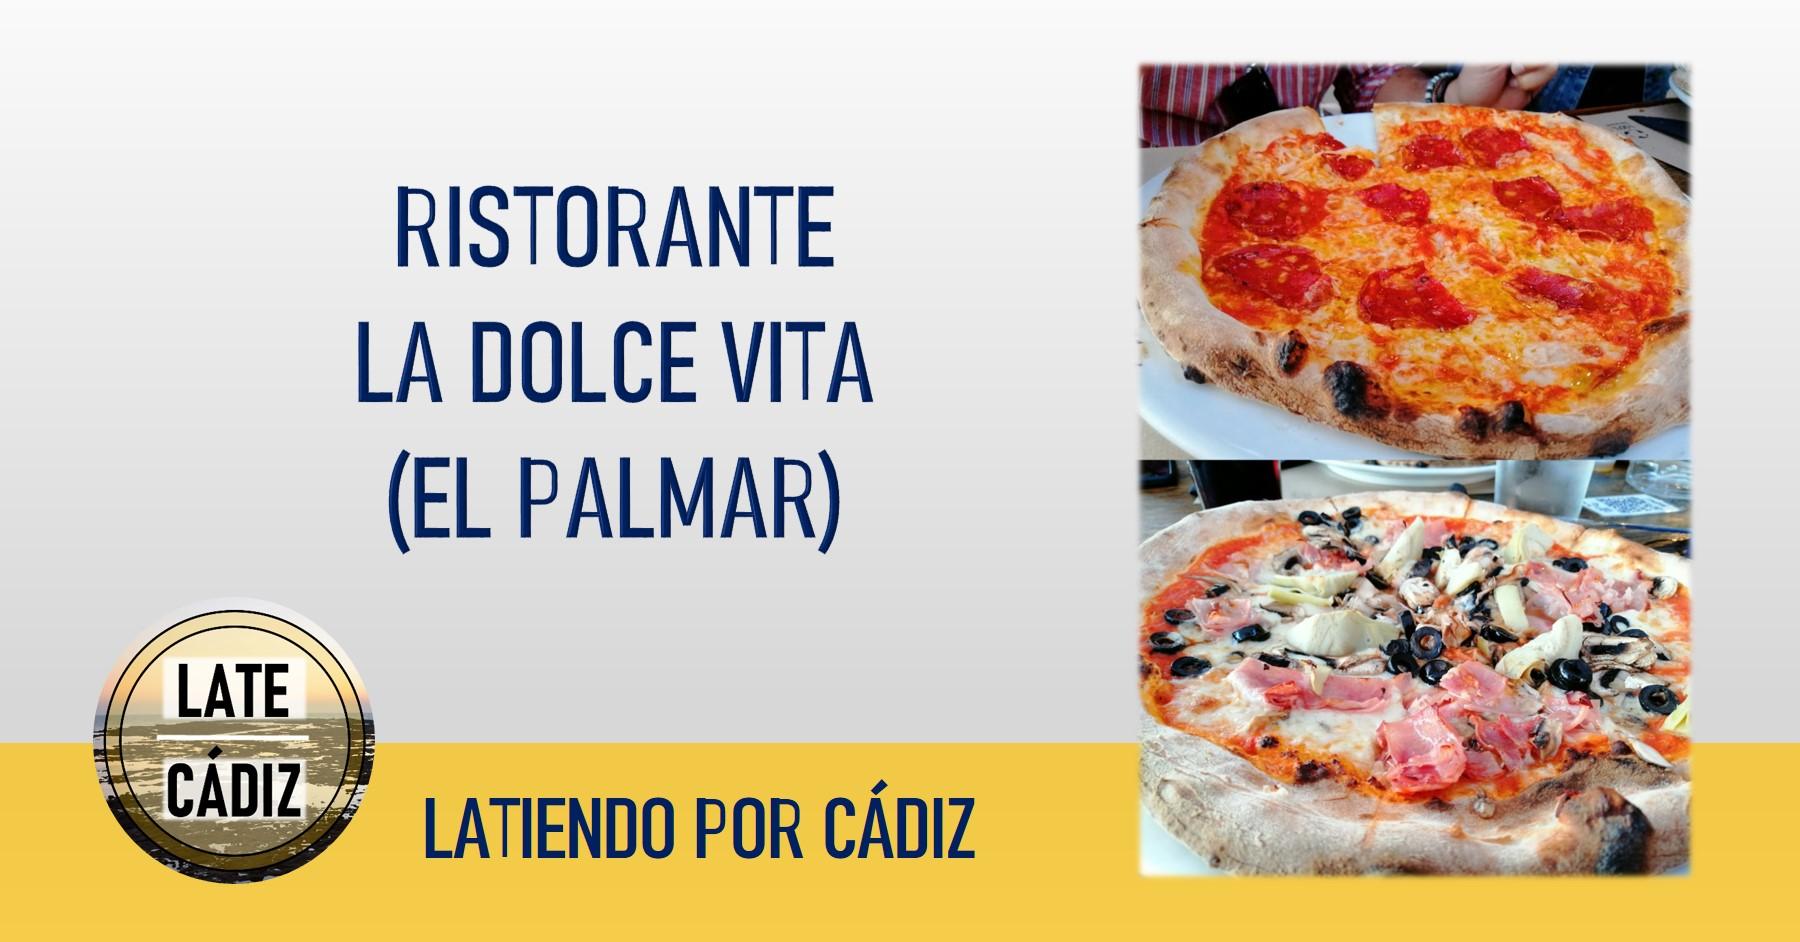 Restaurante Pizzeria LA Dolce Vita El Palmar 00